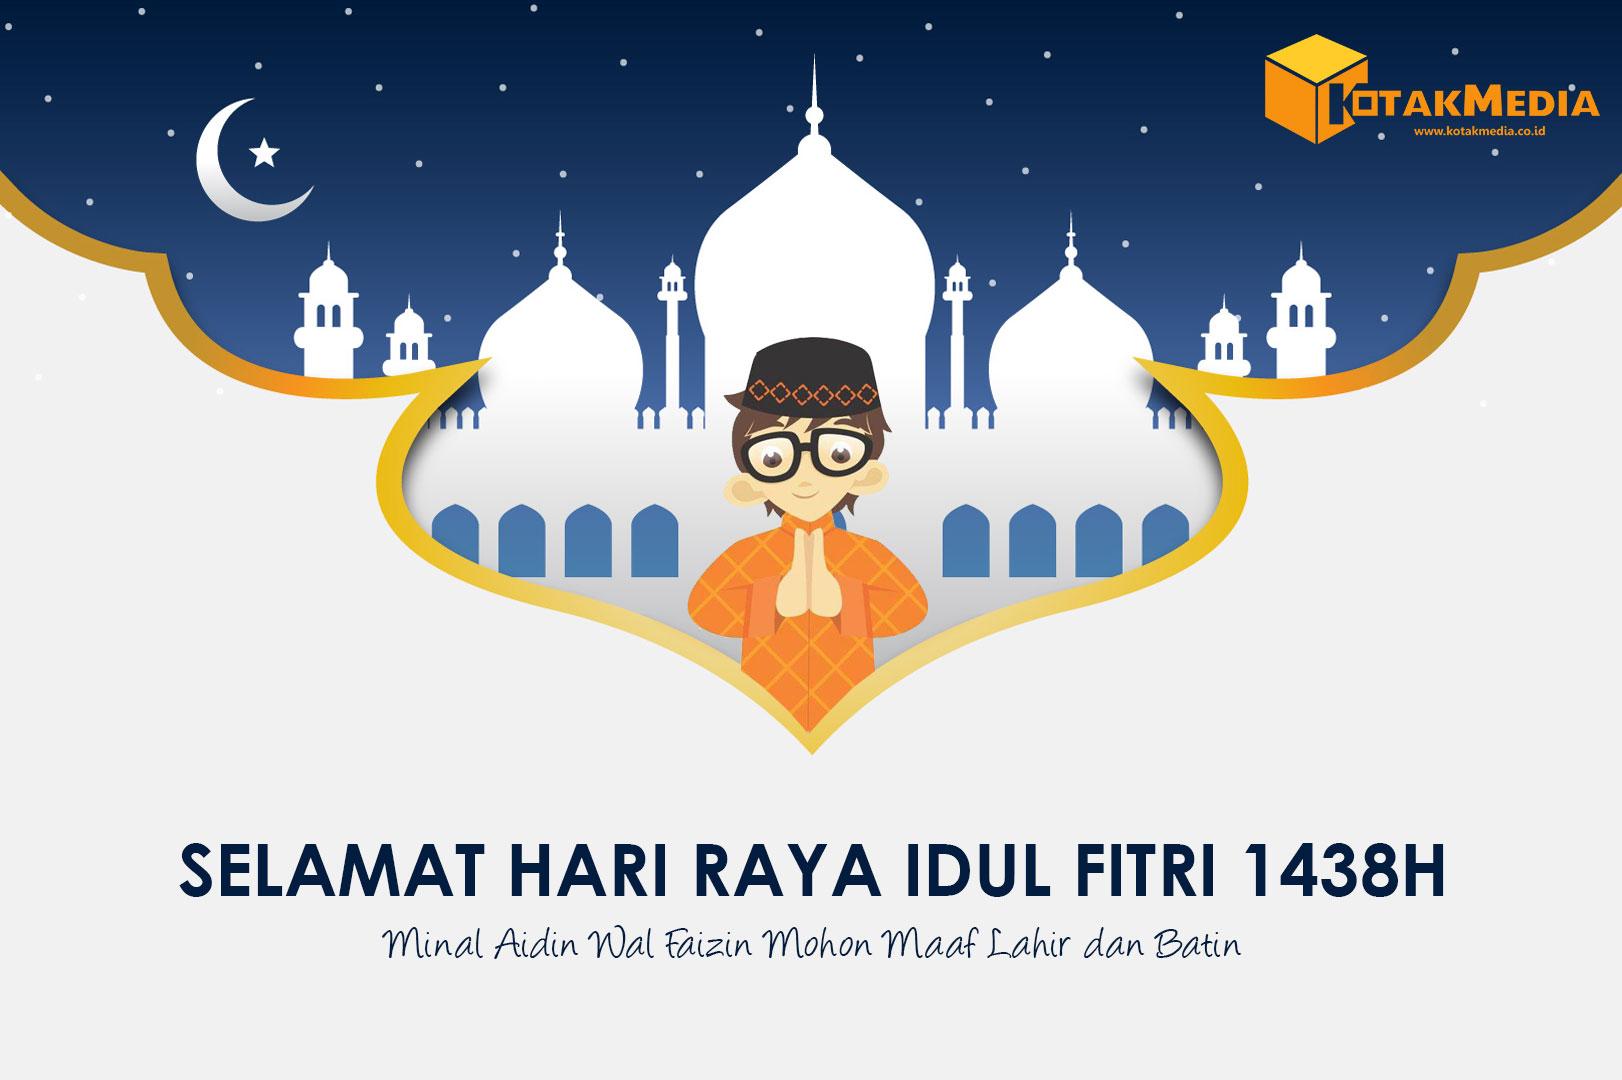 Kotakmedia Indonesia Mengucapkan Selamat Idul Fitri 1438H